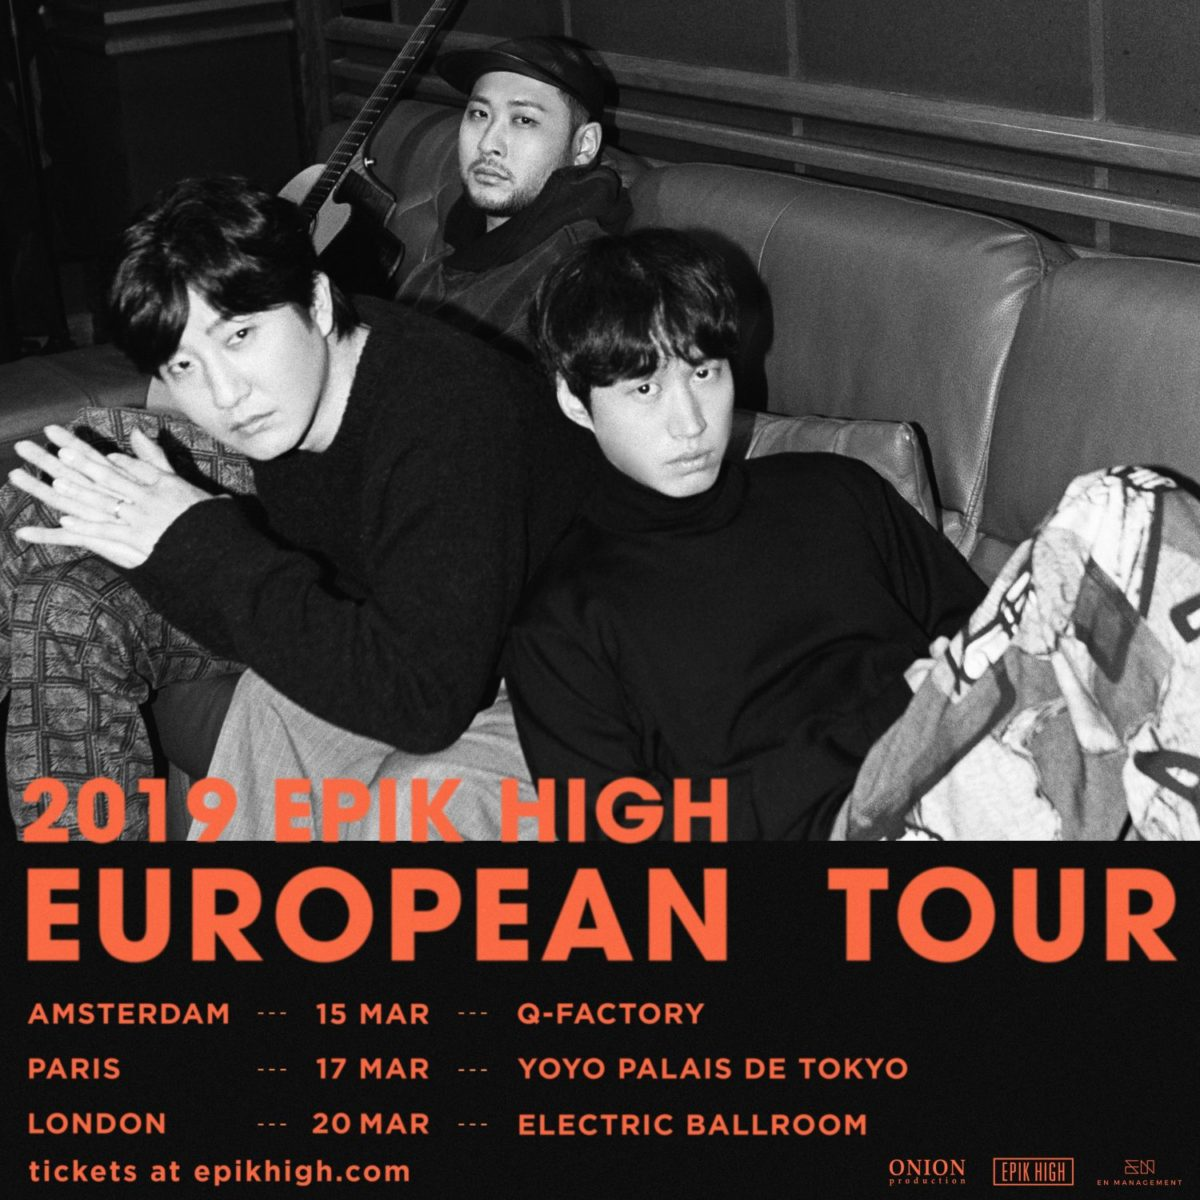 Epik High Europe tour